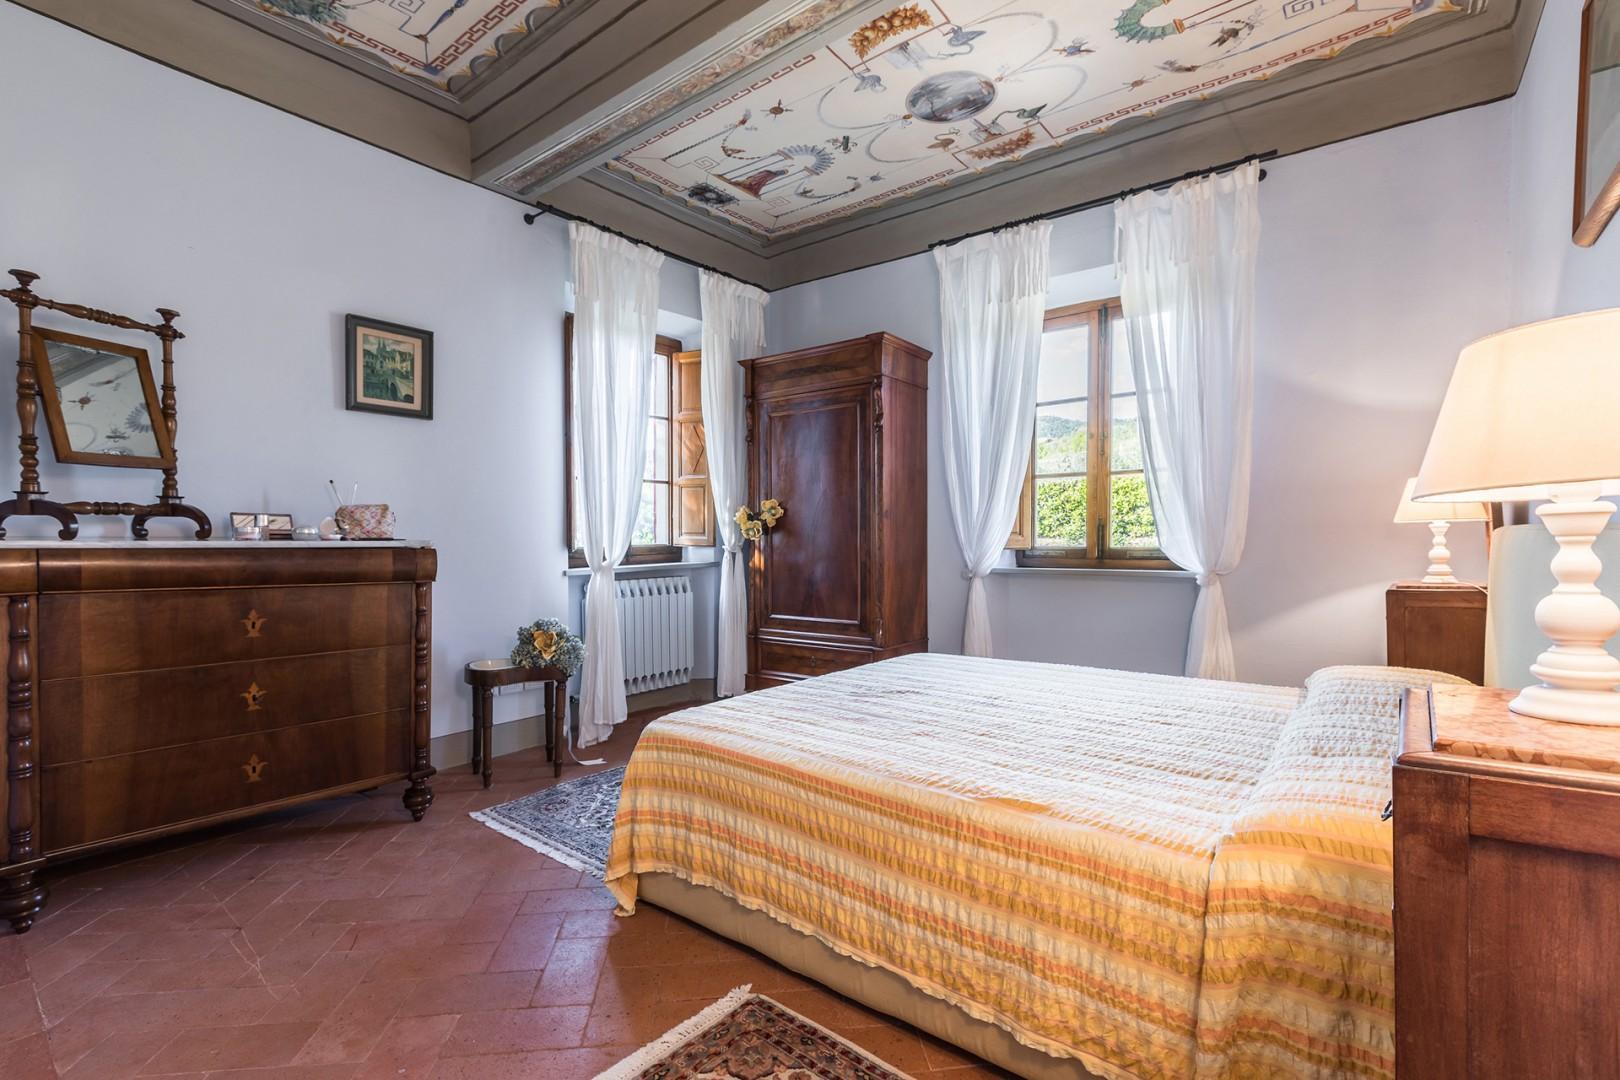 Bedroom 2 on the second floor has a beautiful frescoed ceiling and en suite bathroom.